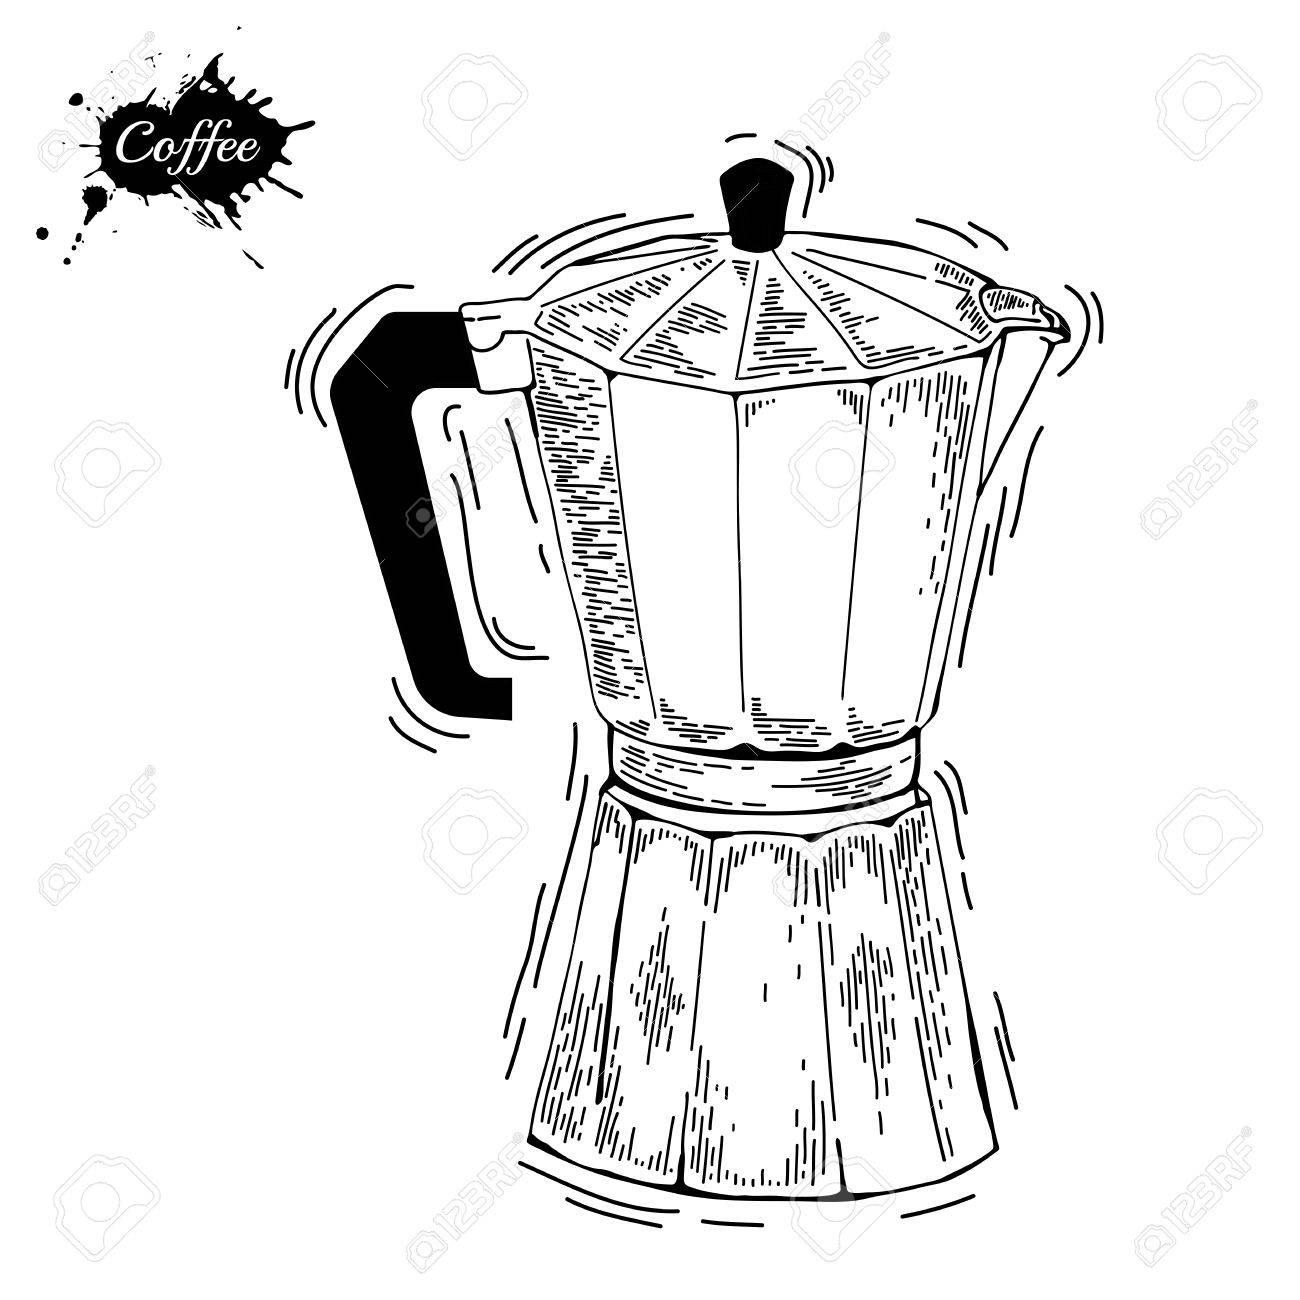 1300x1300 Coffee Ware. Coffee Pot Sketch Illustration. Moka Pot An Engraving